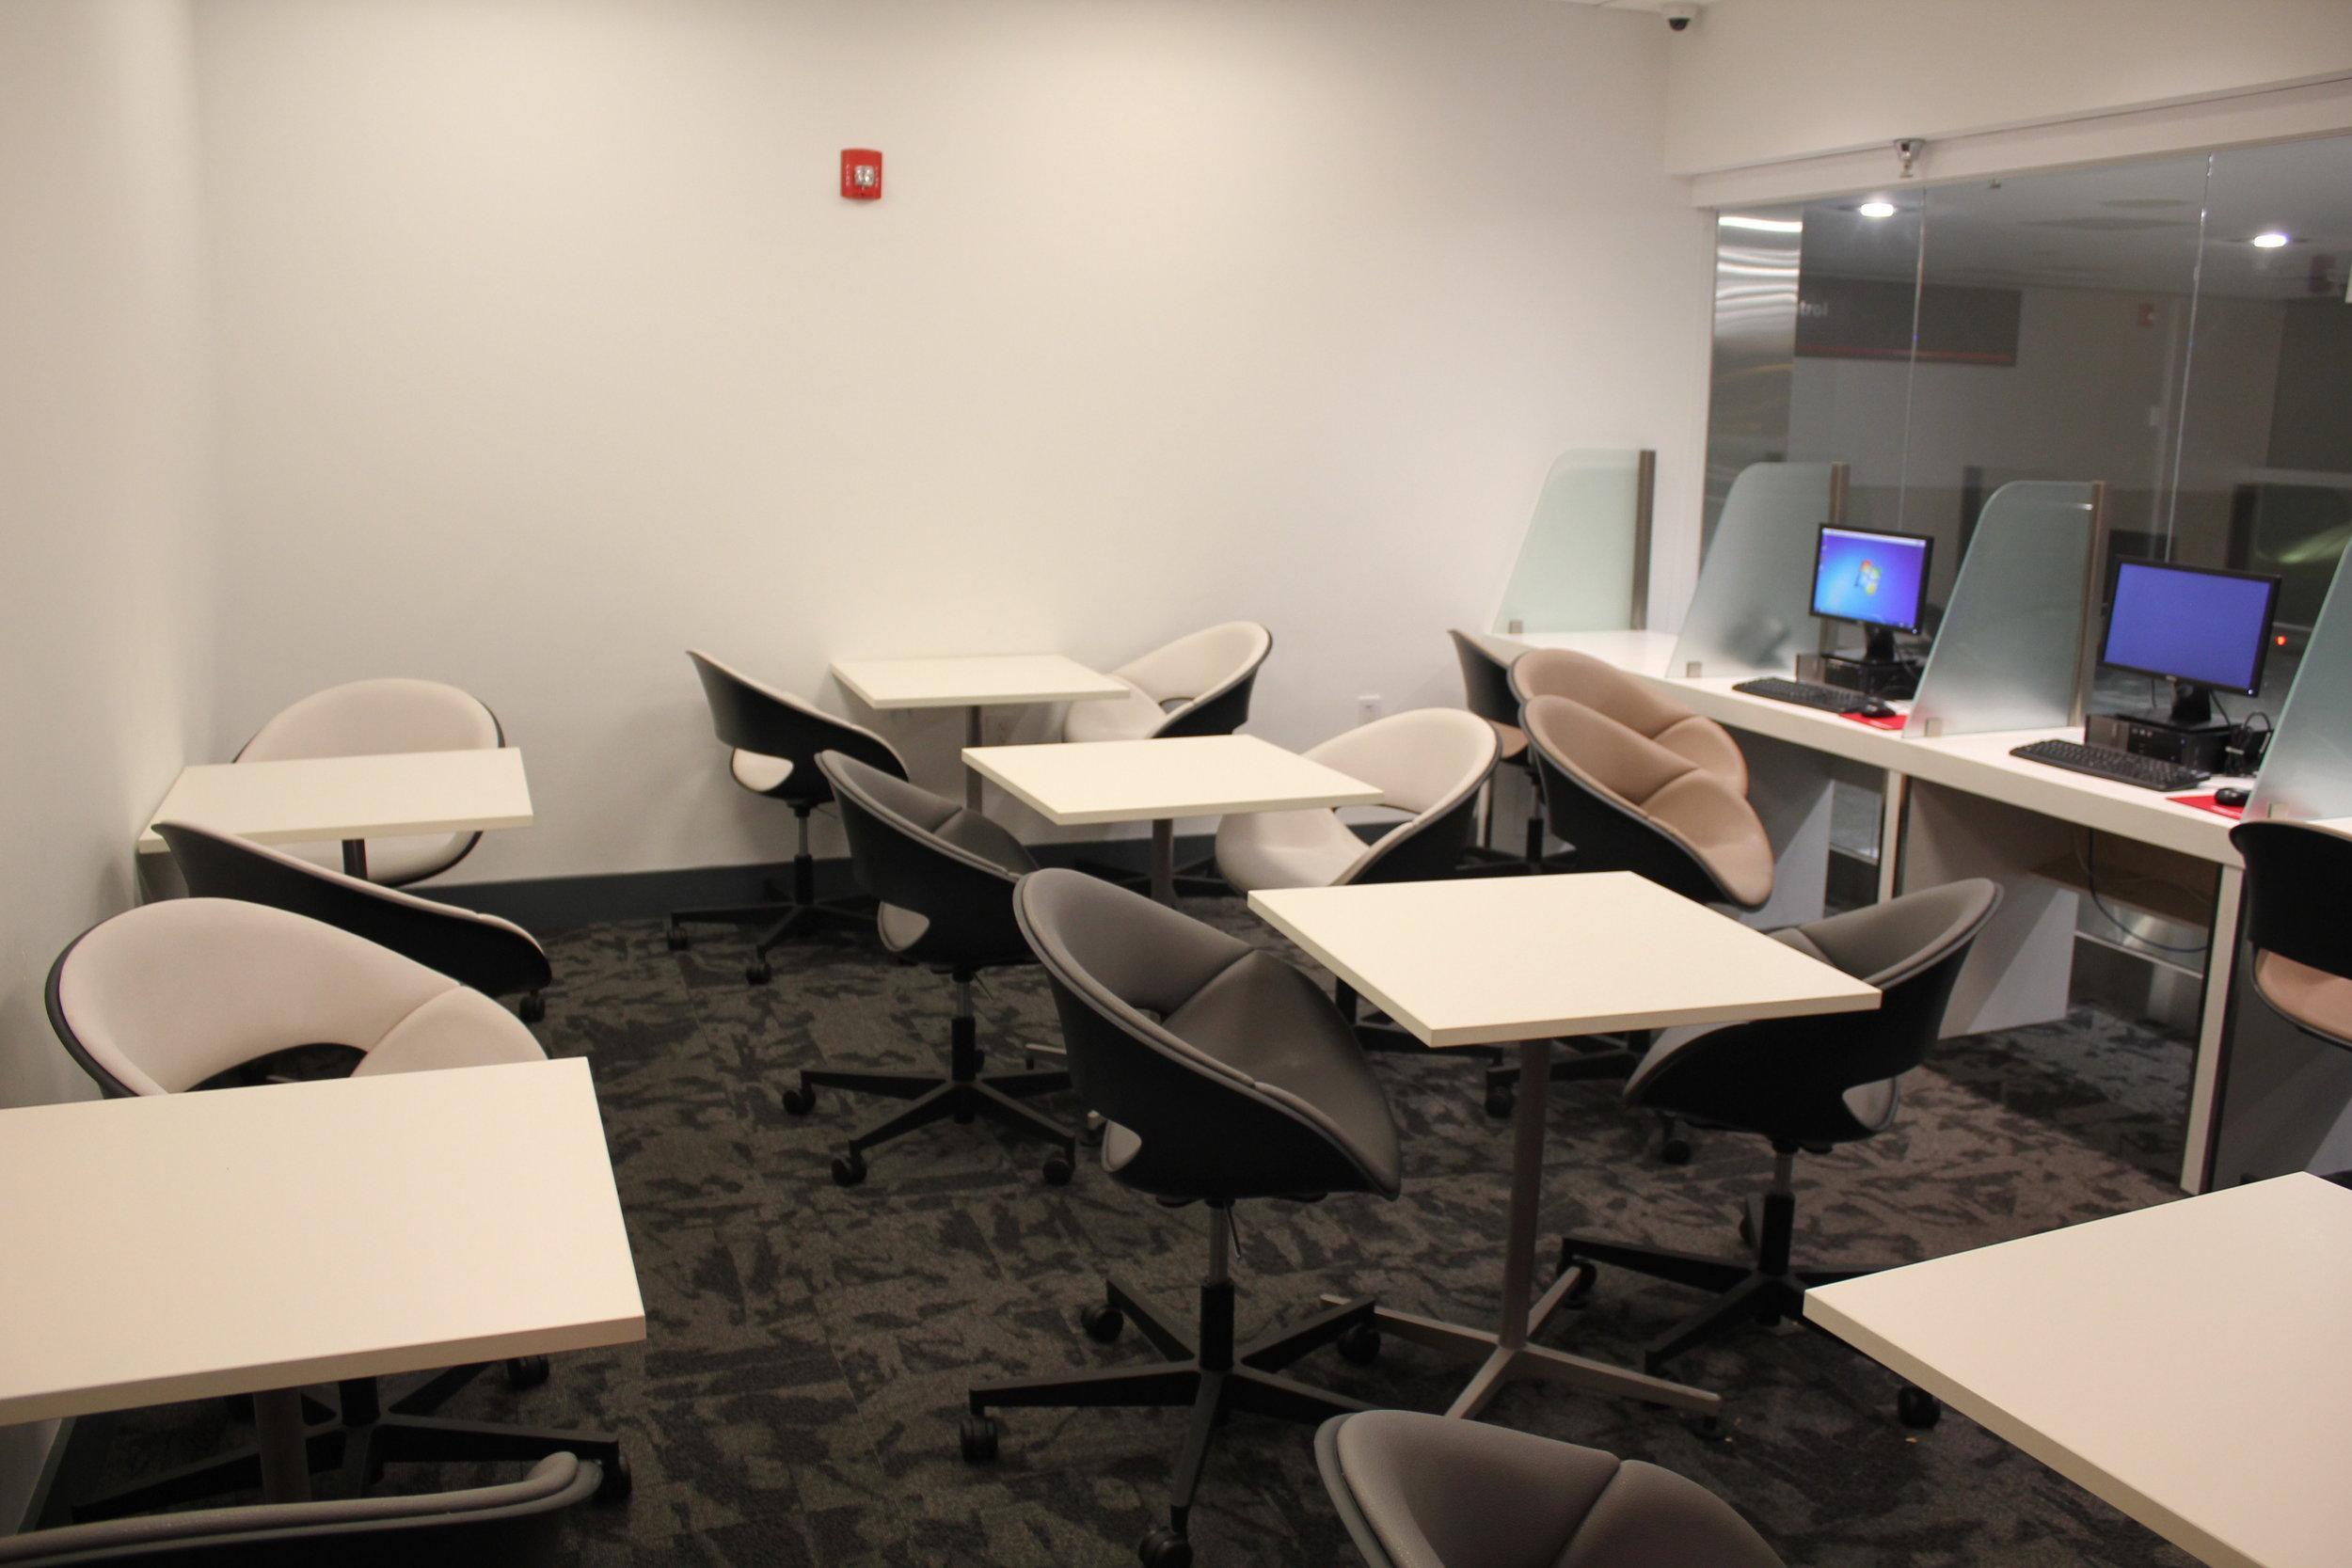 Avianca Lounge Miami – Workstations